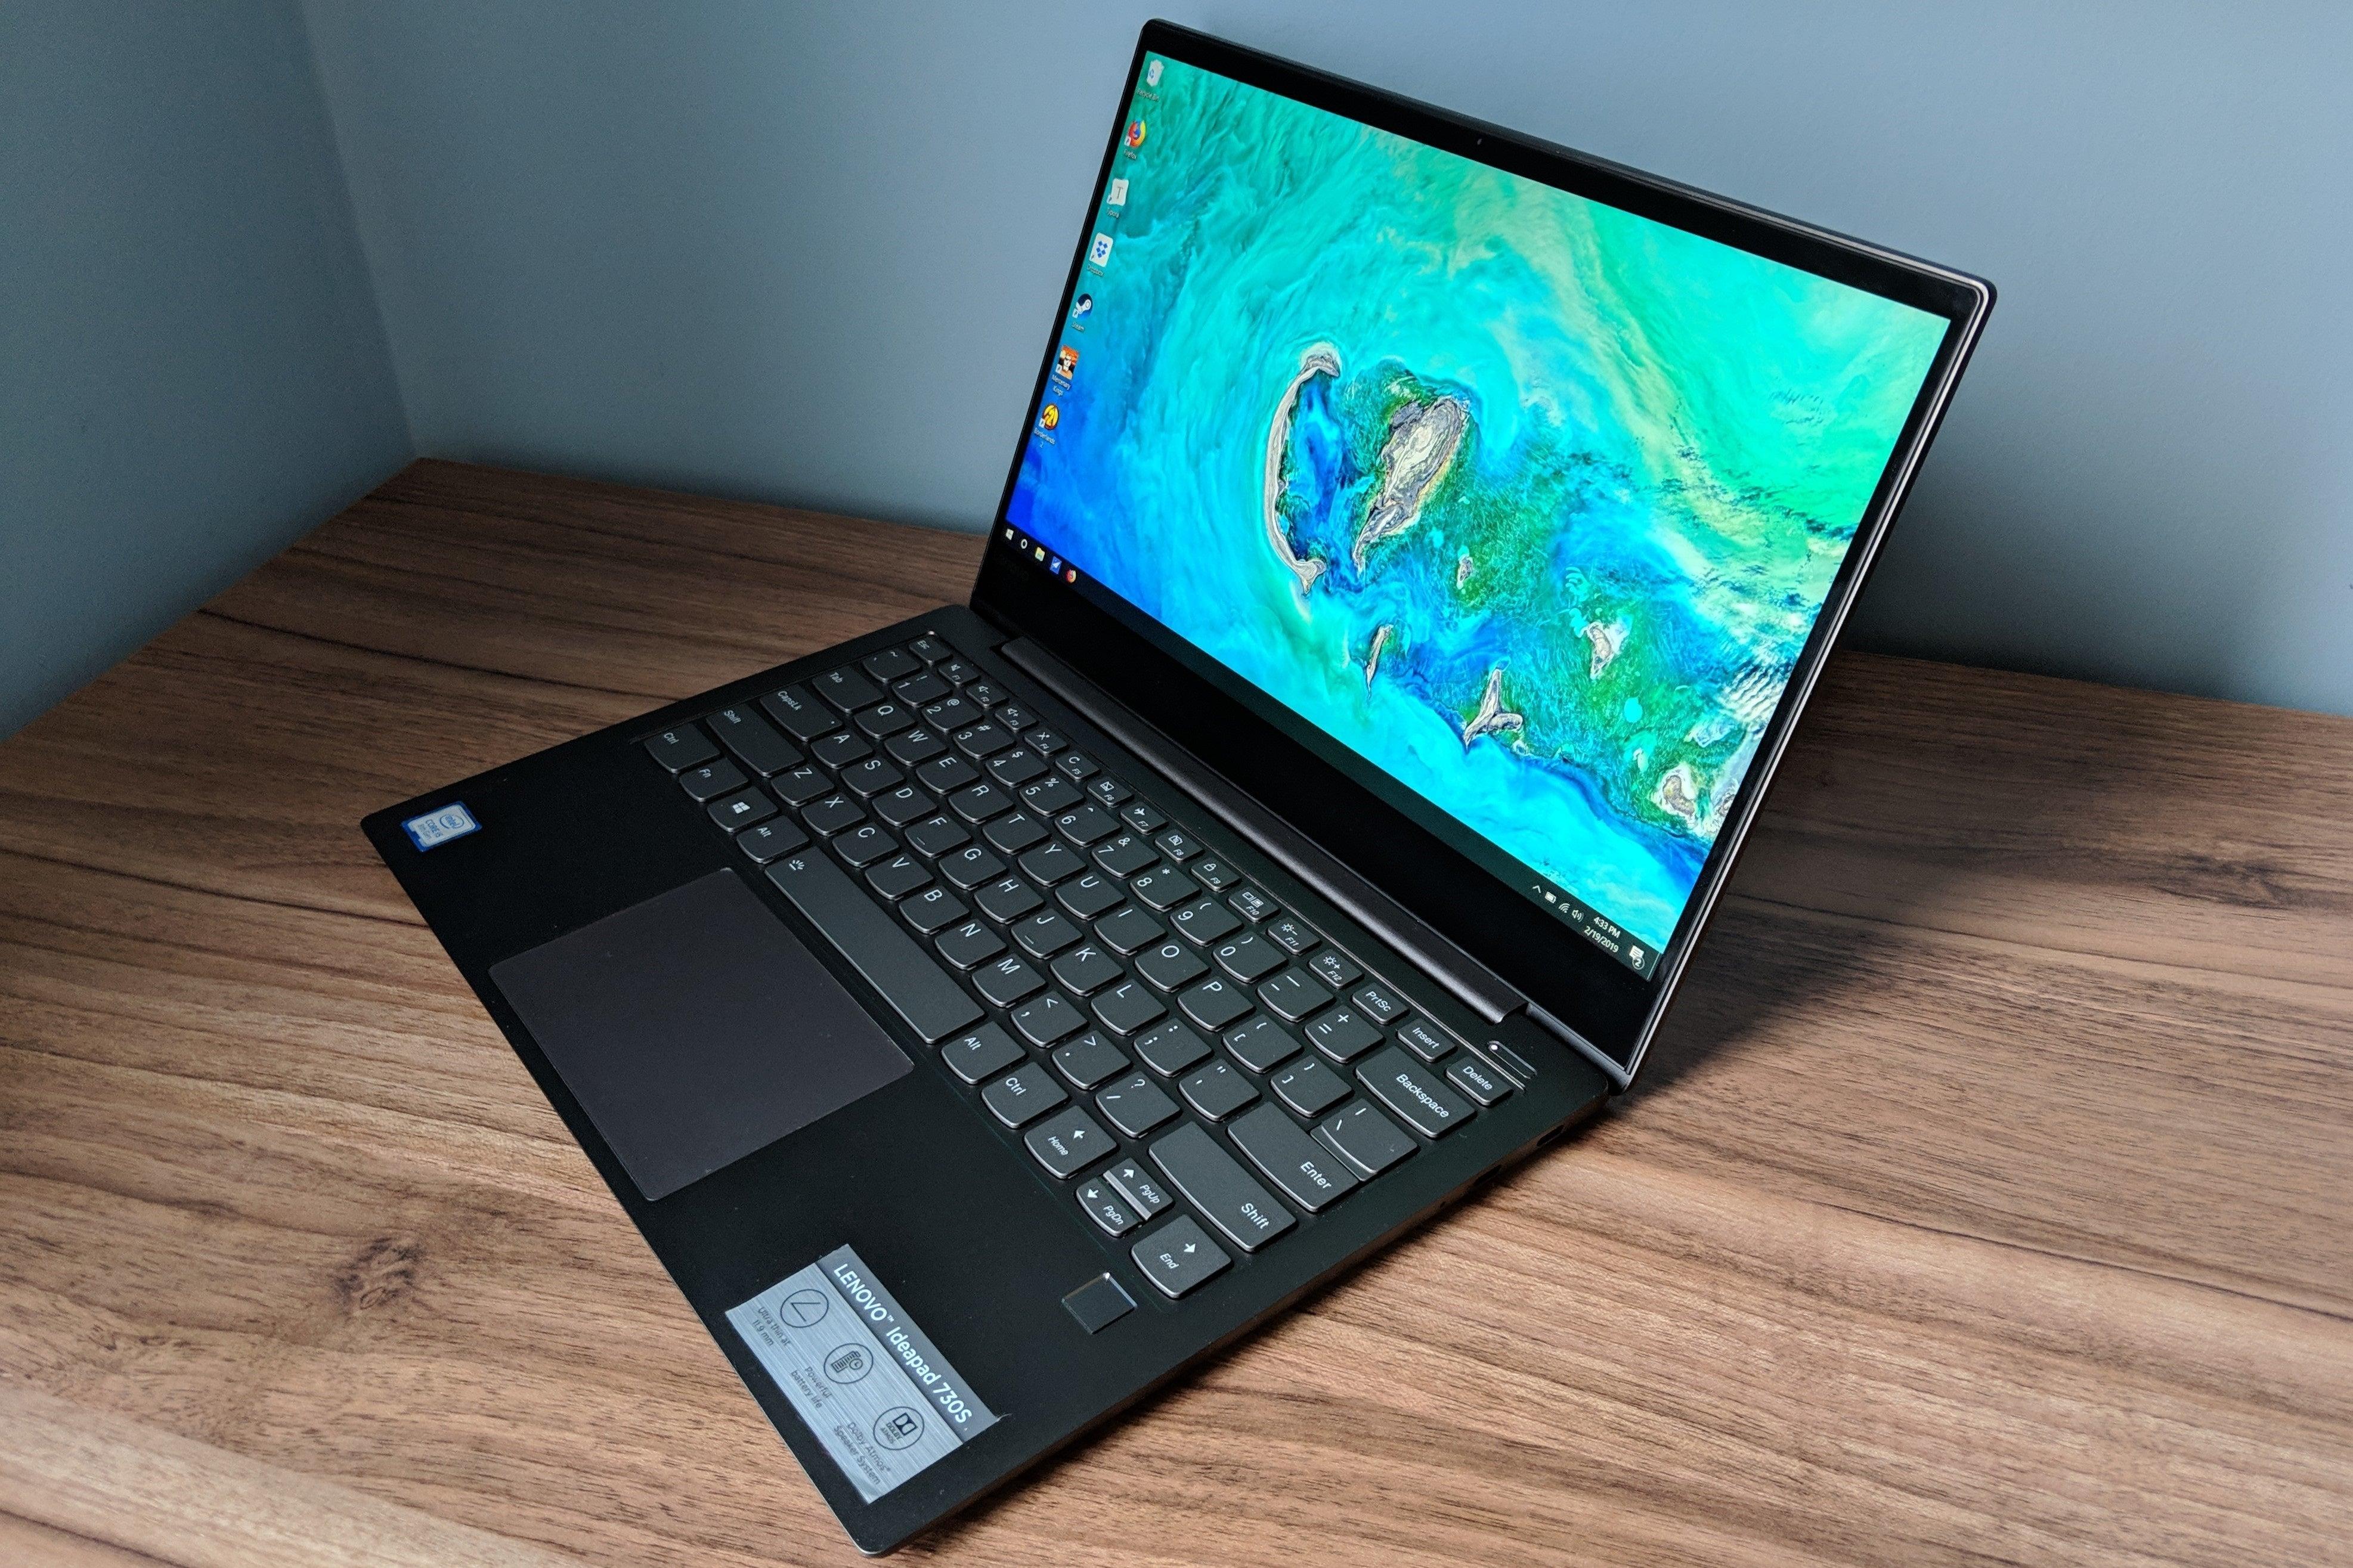 b3998e6a9a8 Lenovo IdeaPad 730S review: A slick laptop with no gimmicks | PCWorld